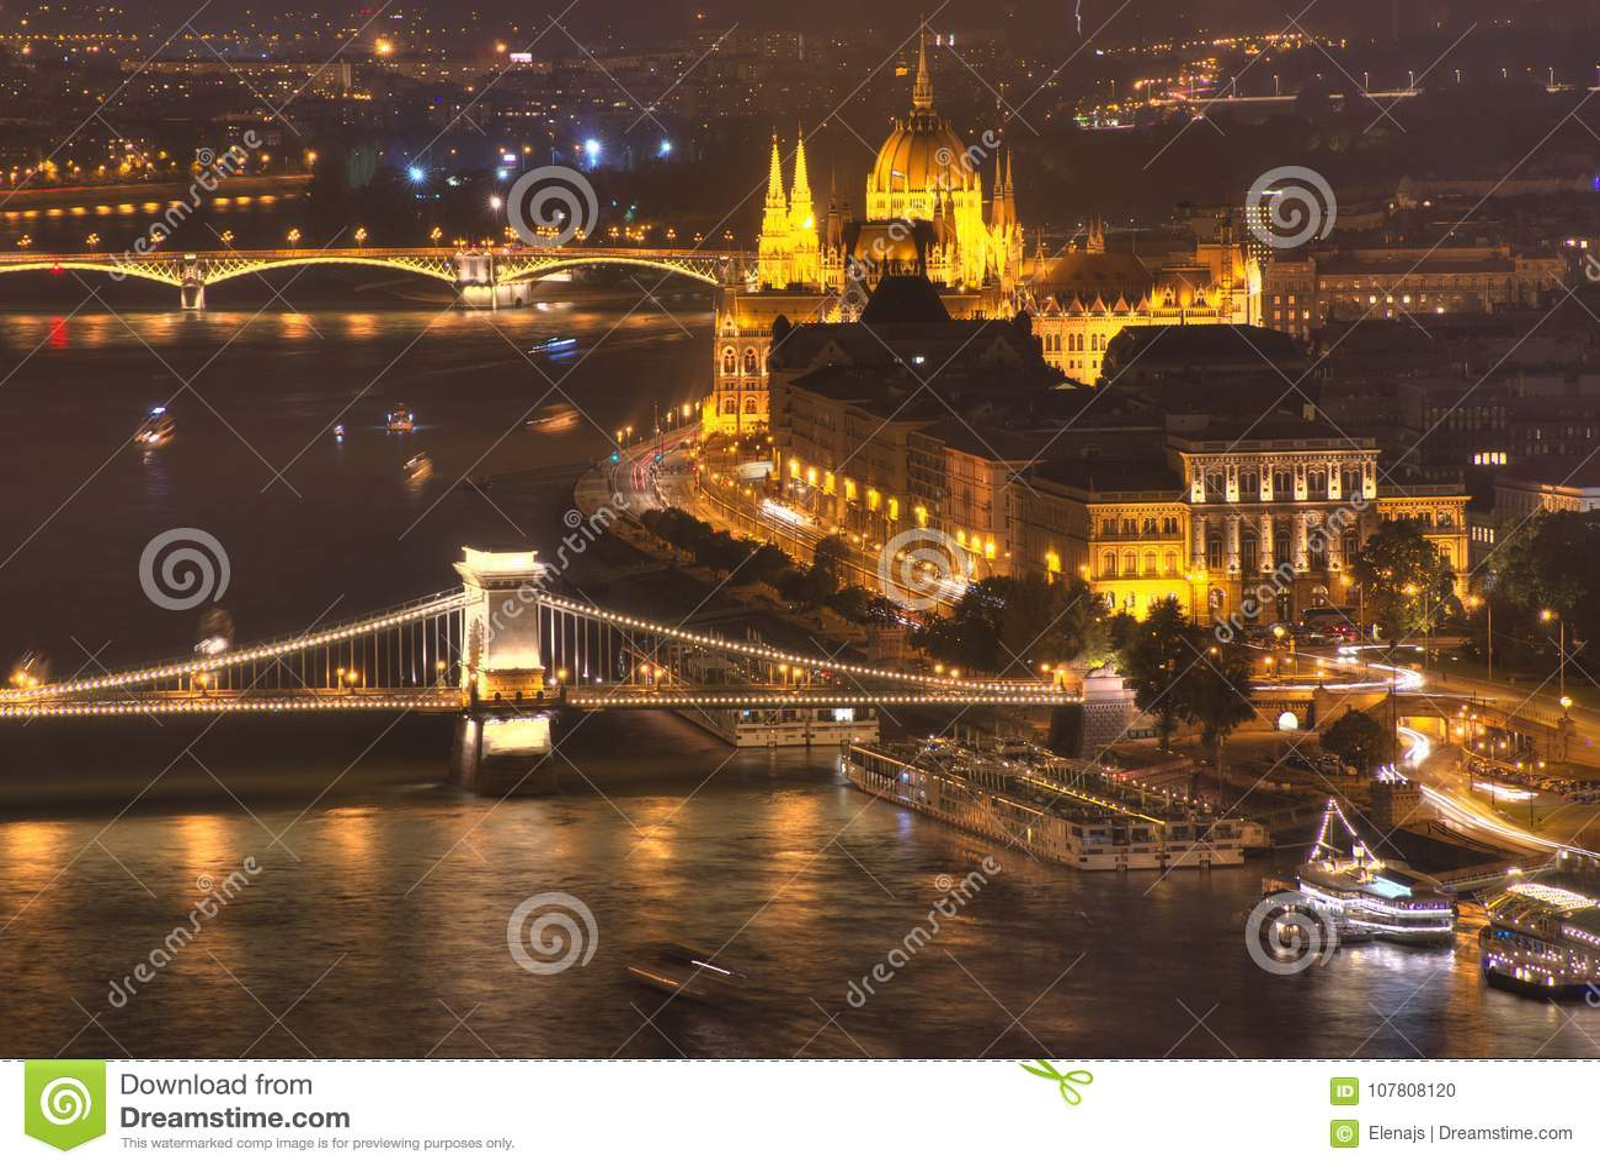 Budapest, Hungary, Budapest Parliament, Chain bridge, Danube river - night picture